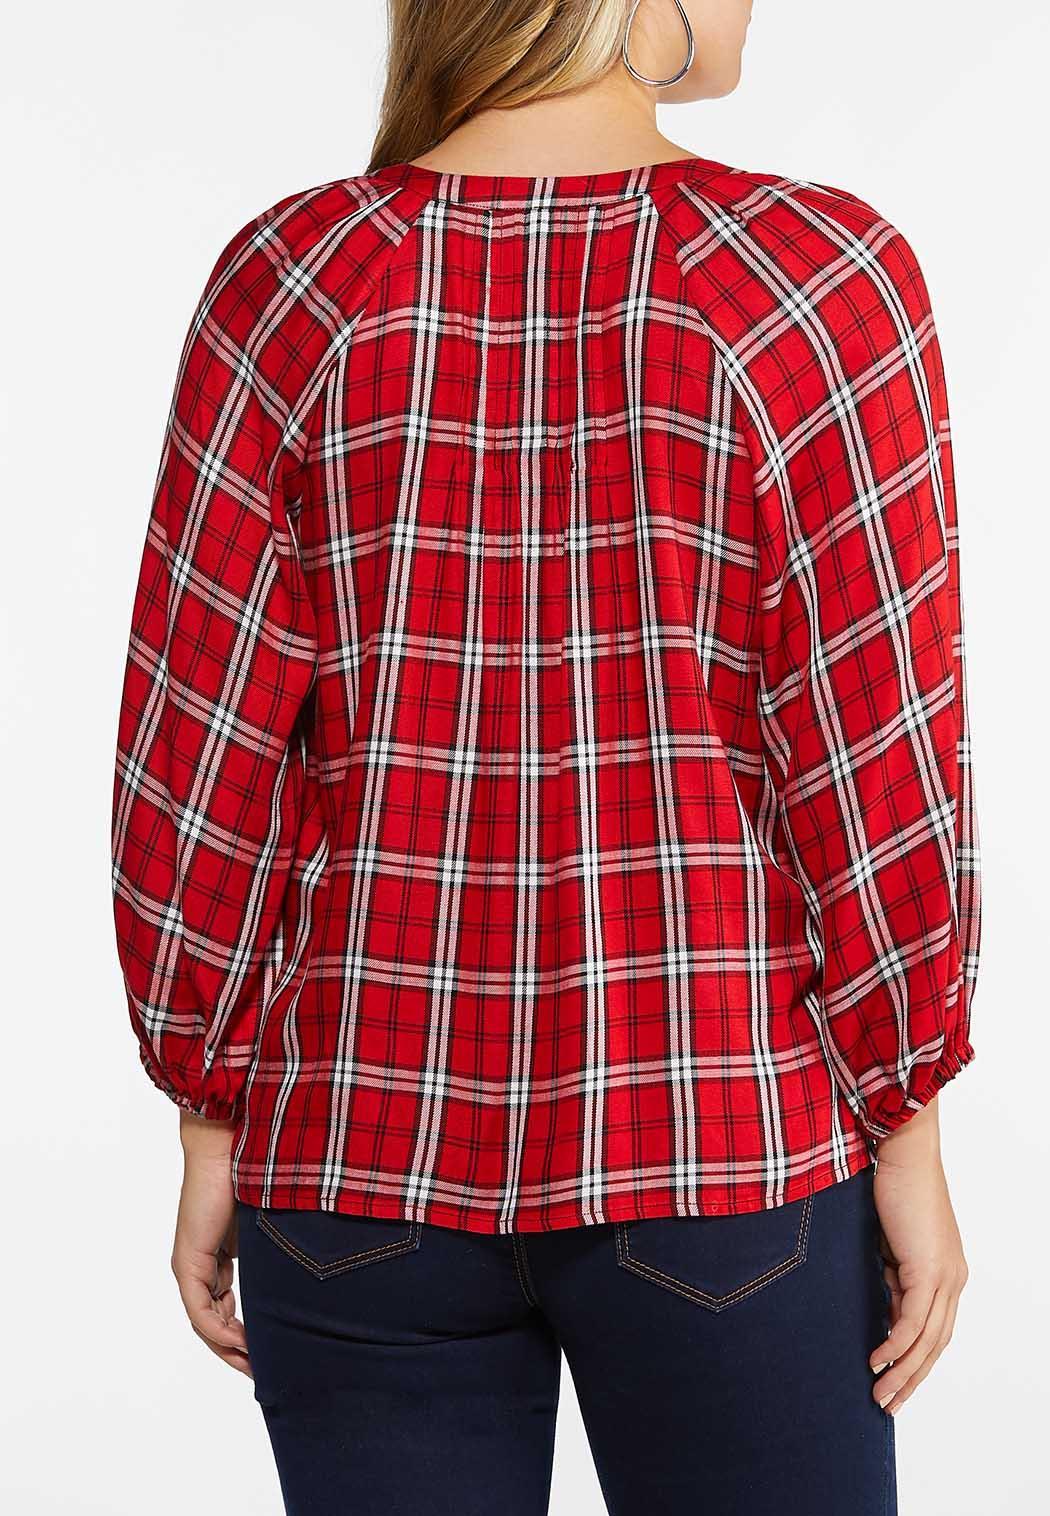 Plus Size Red Plaid Poet Top (Item #44446610)